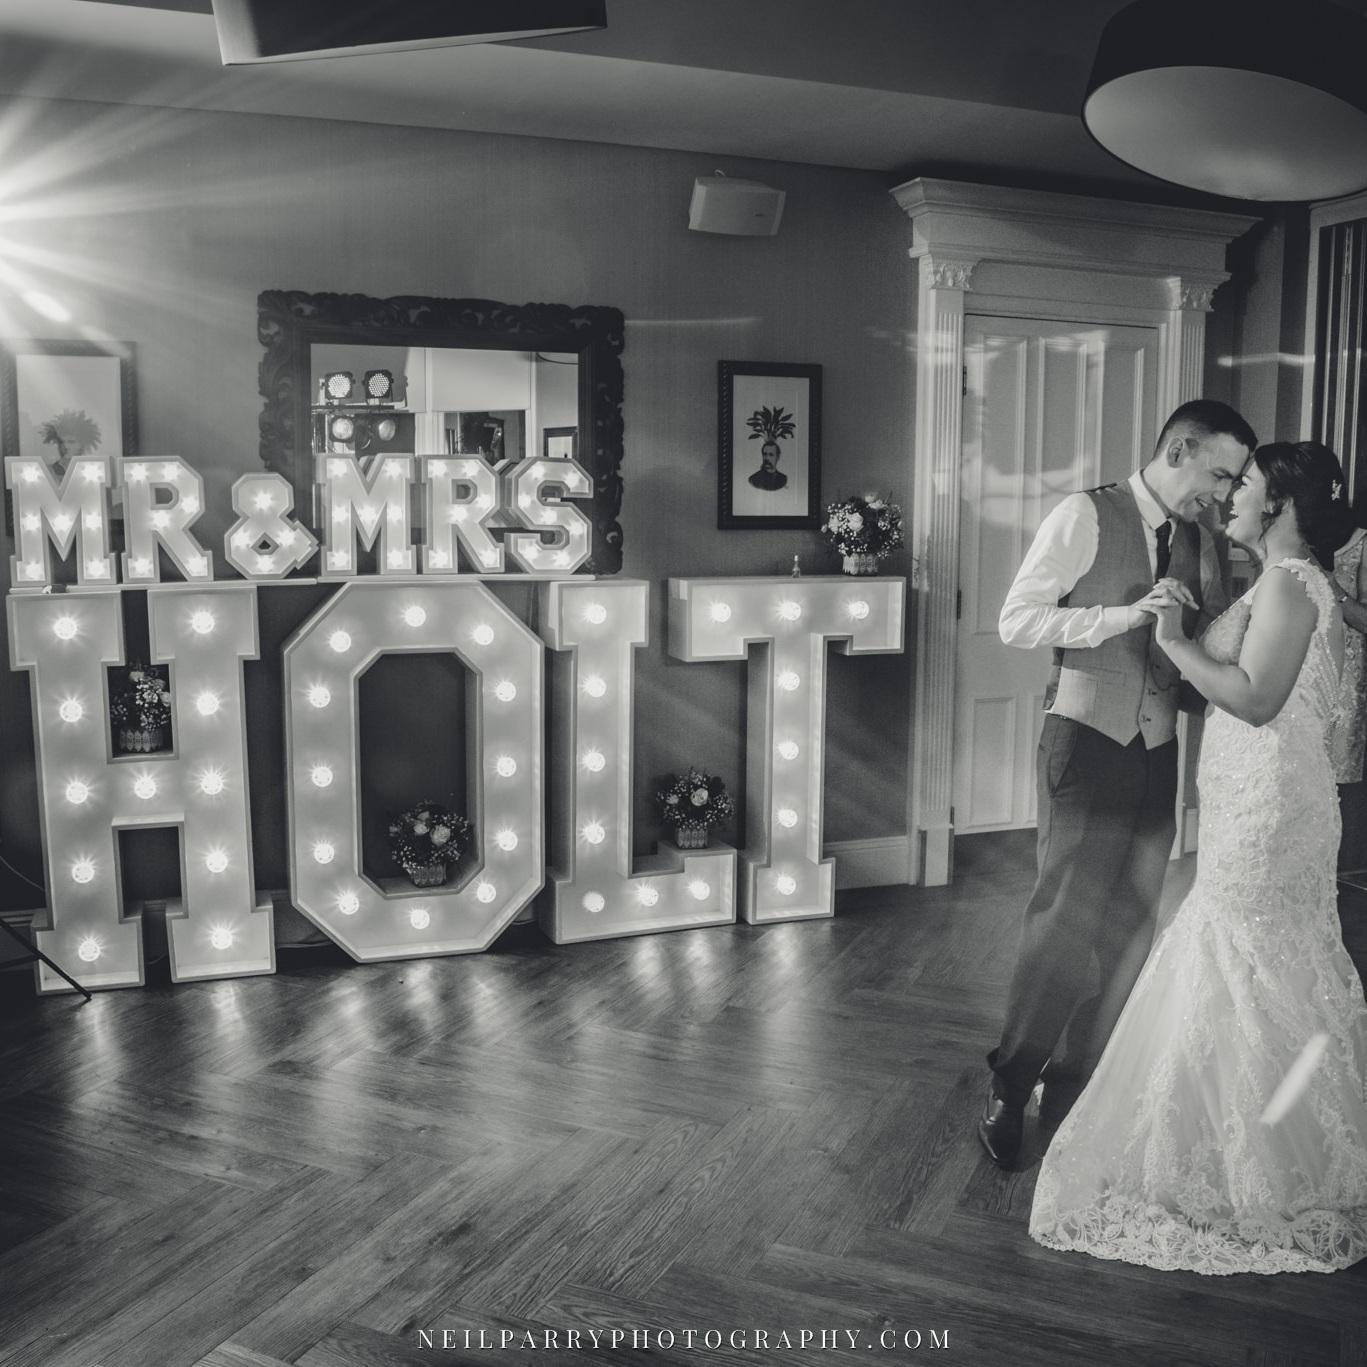 Light+Up+Letter+Hire+Weddings